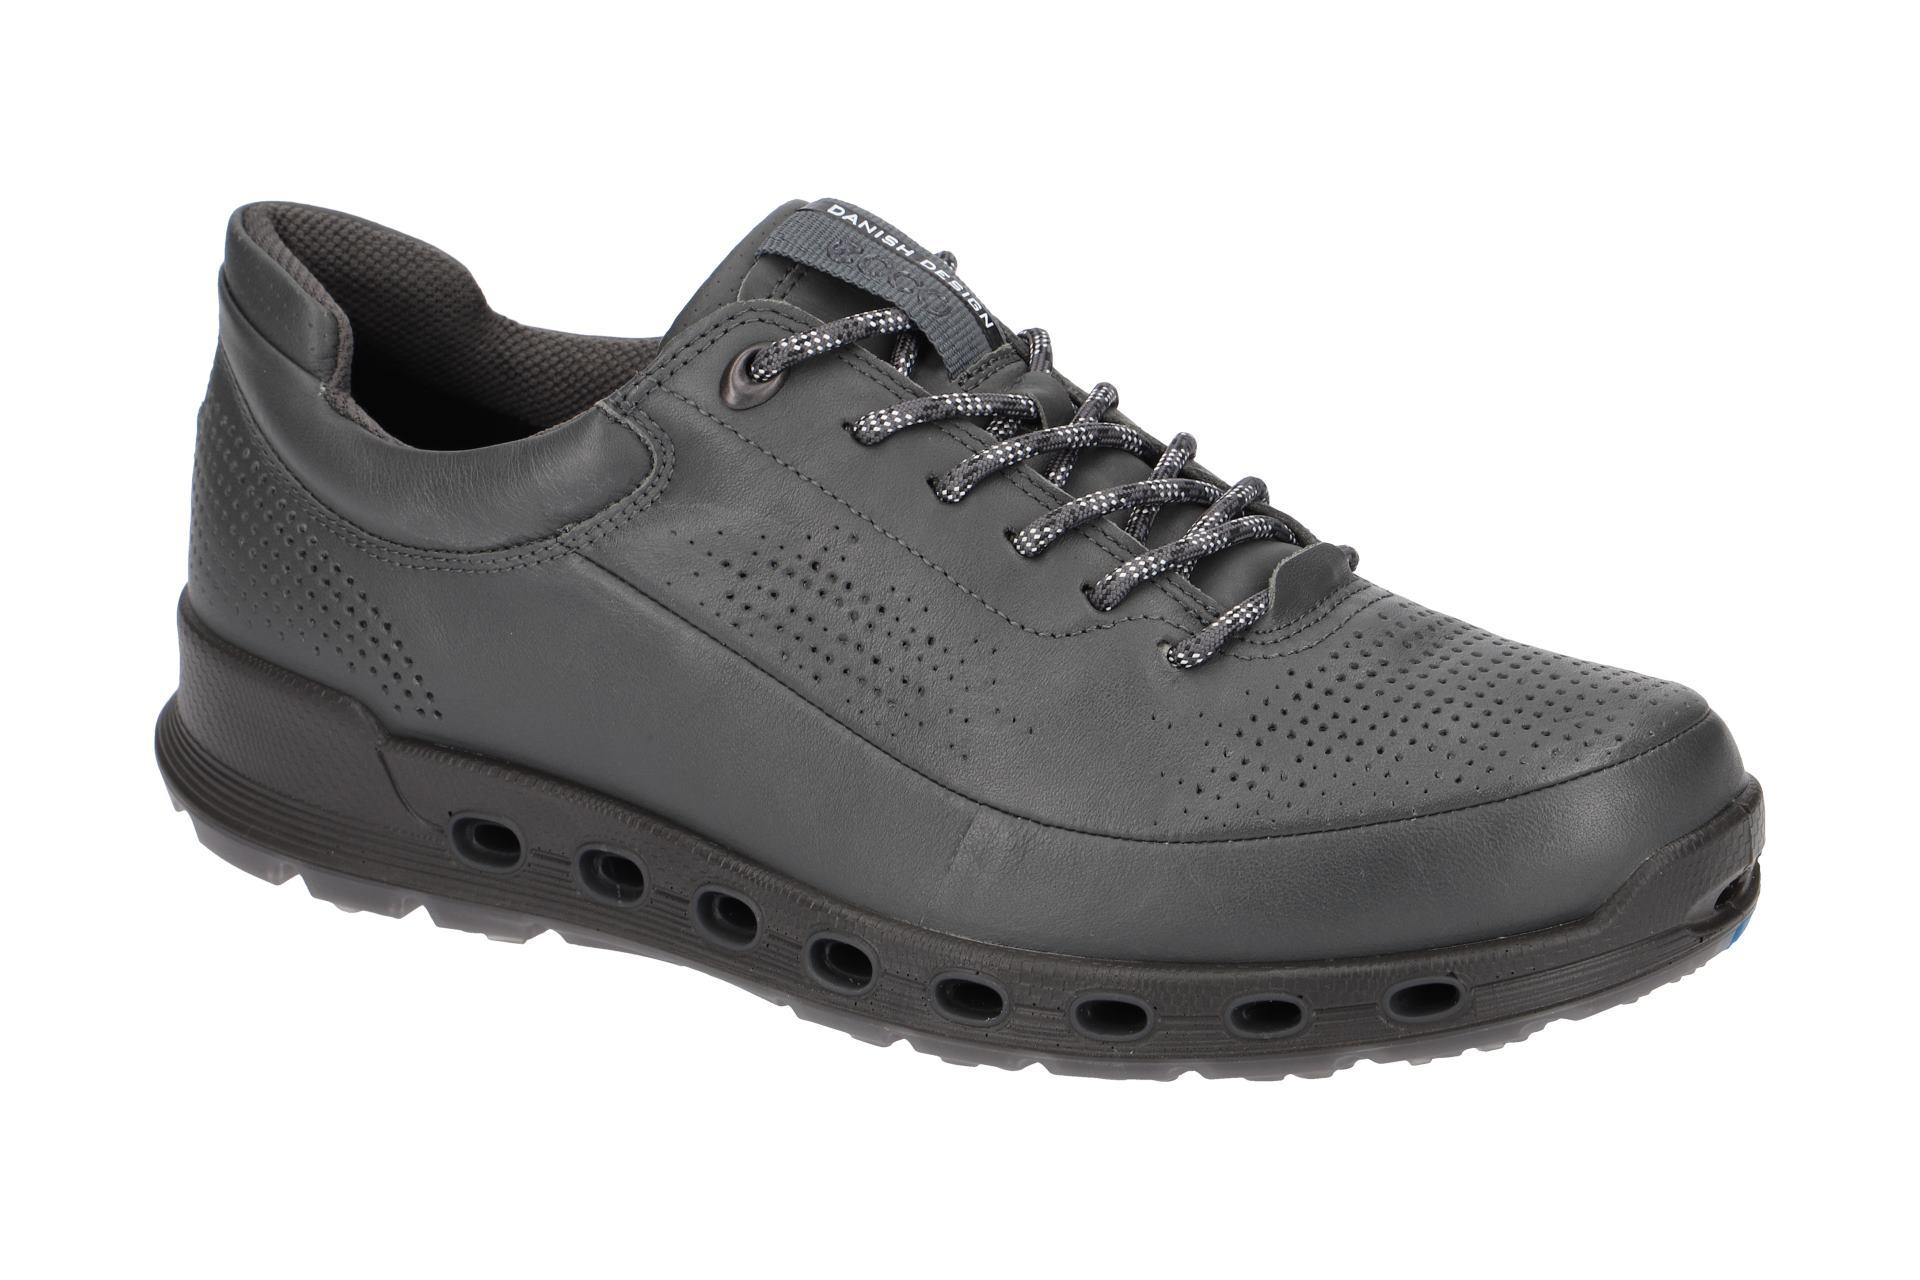 official photos dbc96 7e866 Details zu Ecco Schuhe COOL 2.0 grau Herrenschuhe Sneakers 84251456586 NEU